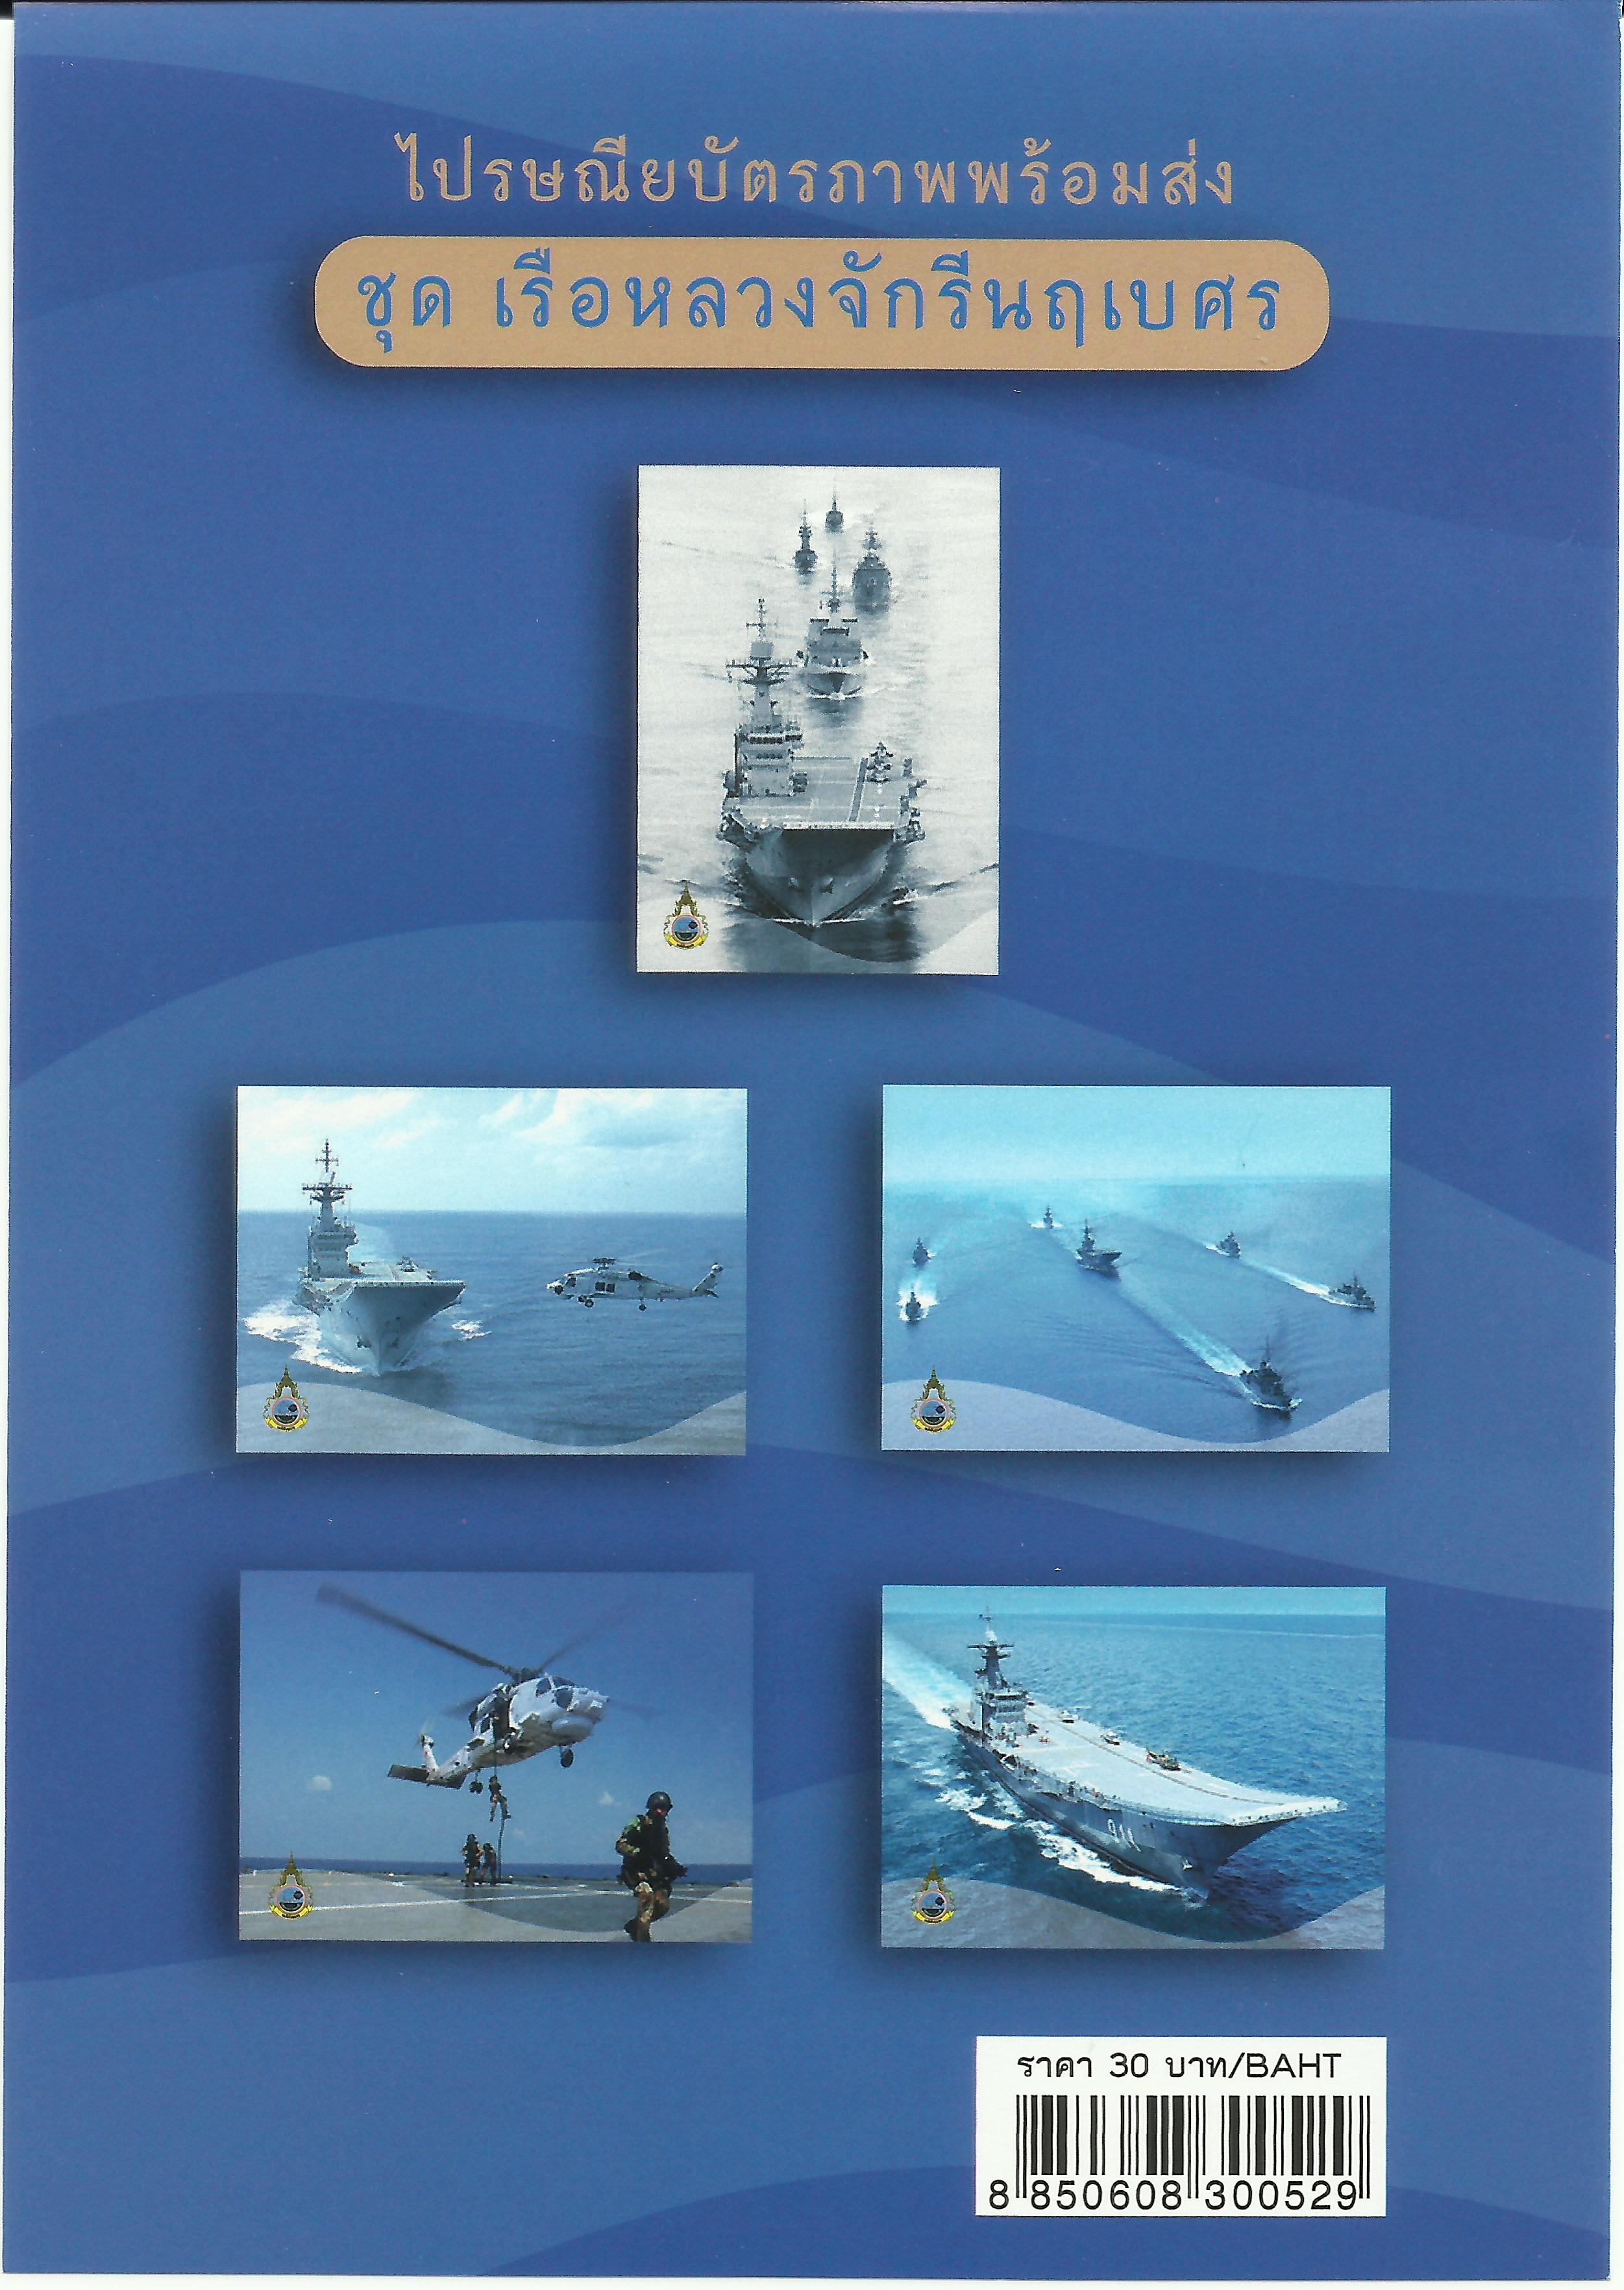 Thailand - Royal Thai Navy HTMS Chakri Naruebet pre-paid postal cards set - 2014: package insert